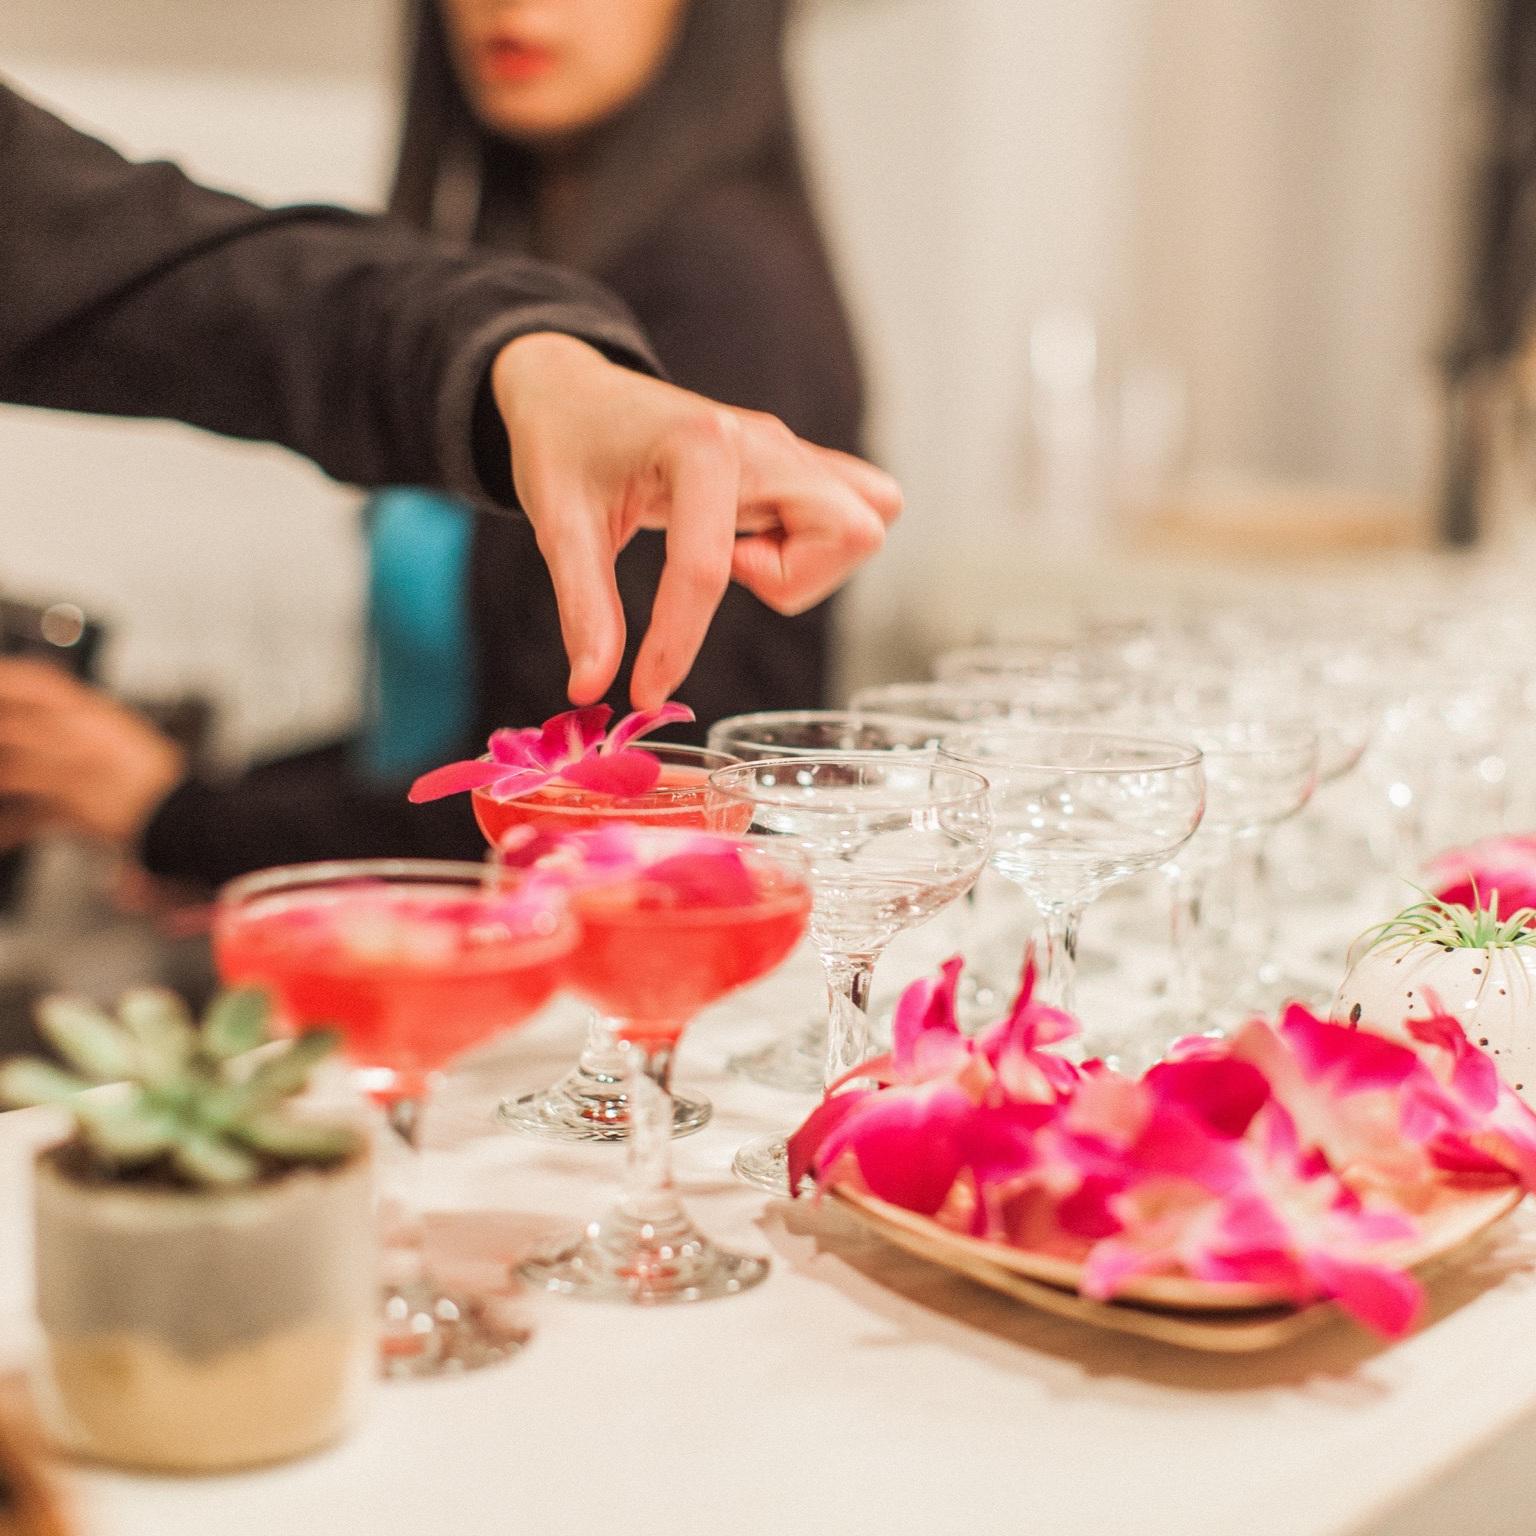 austin mobile bar drink slingers edible flowers